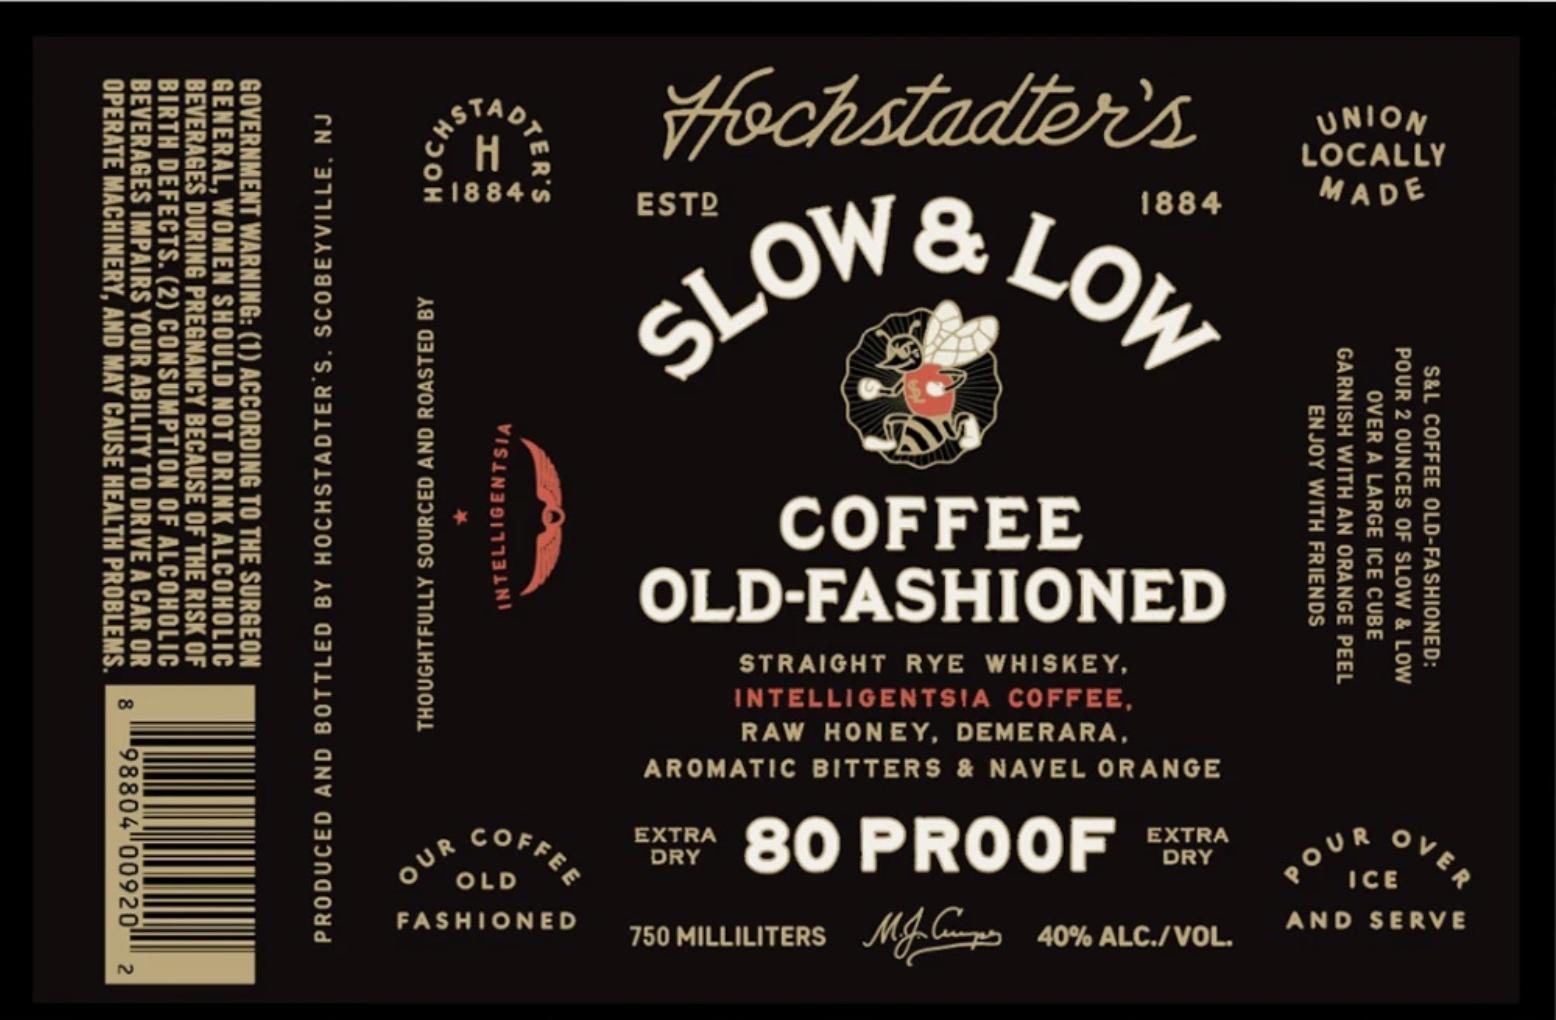 Coffee Old-Fashioned